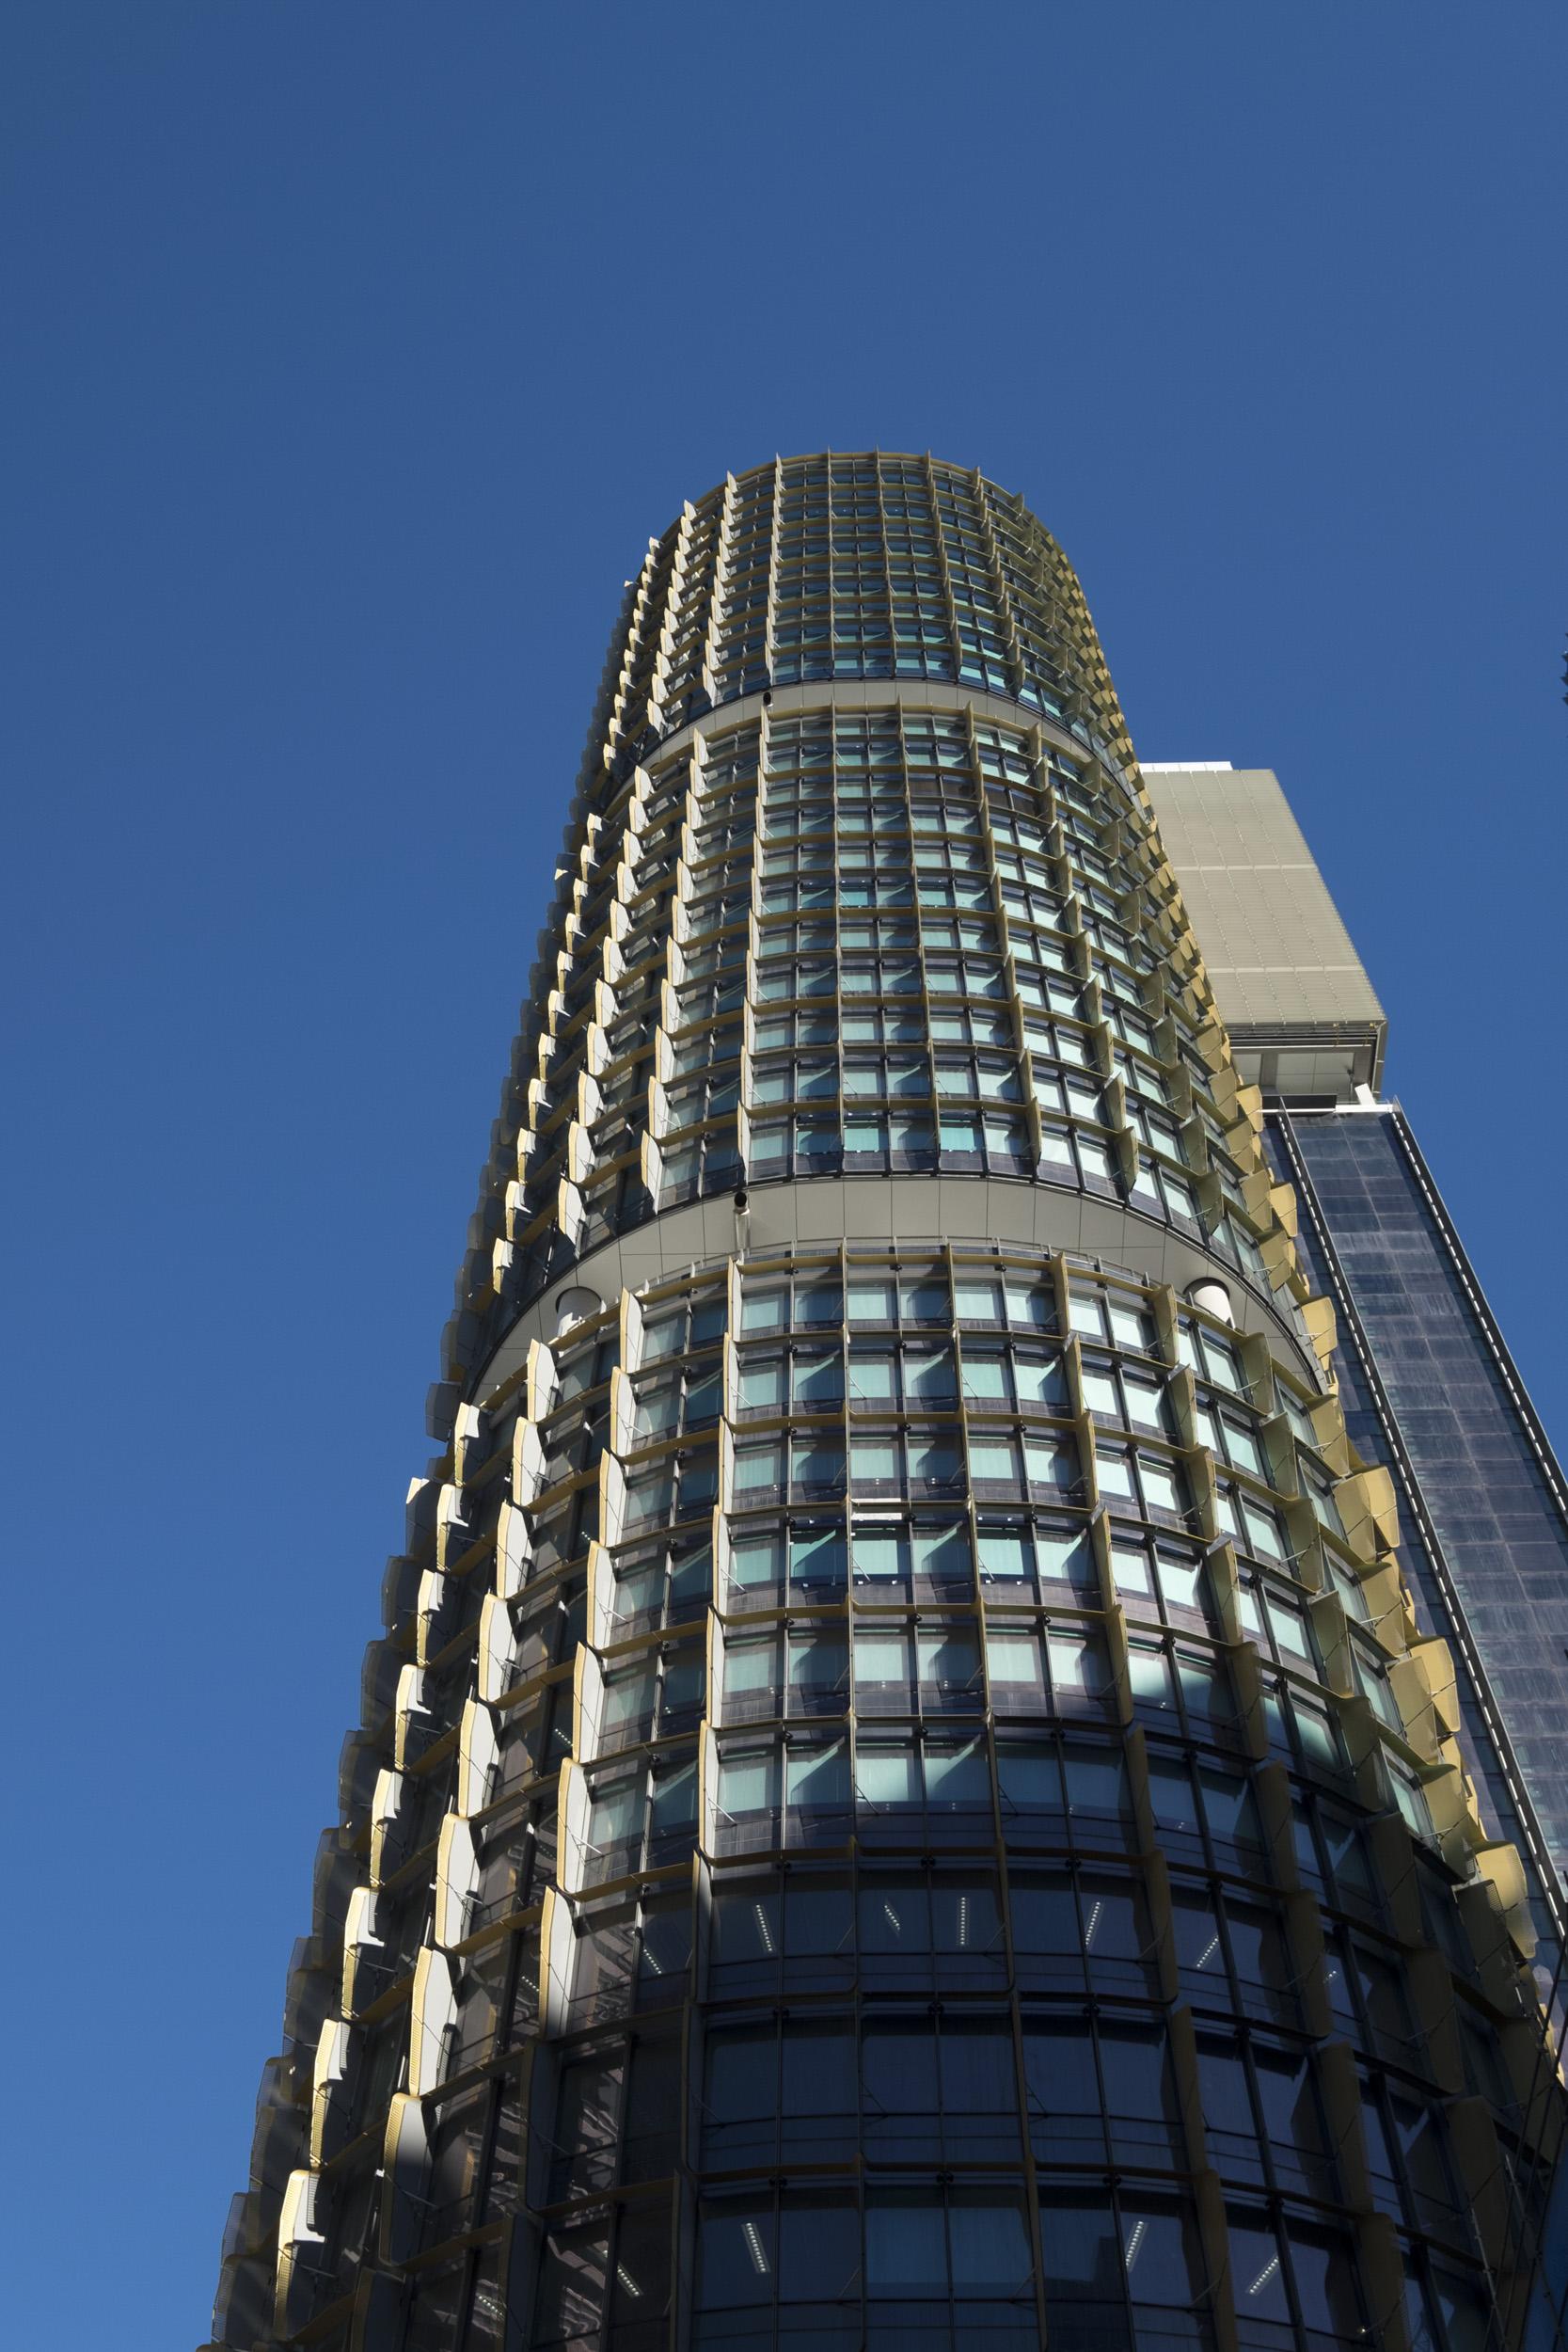 hirise_architecture_sydney_australia_18.jpg